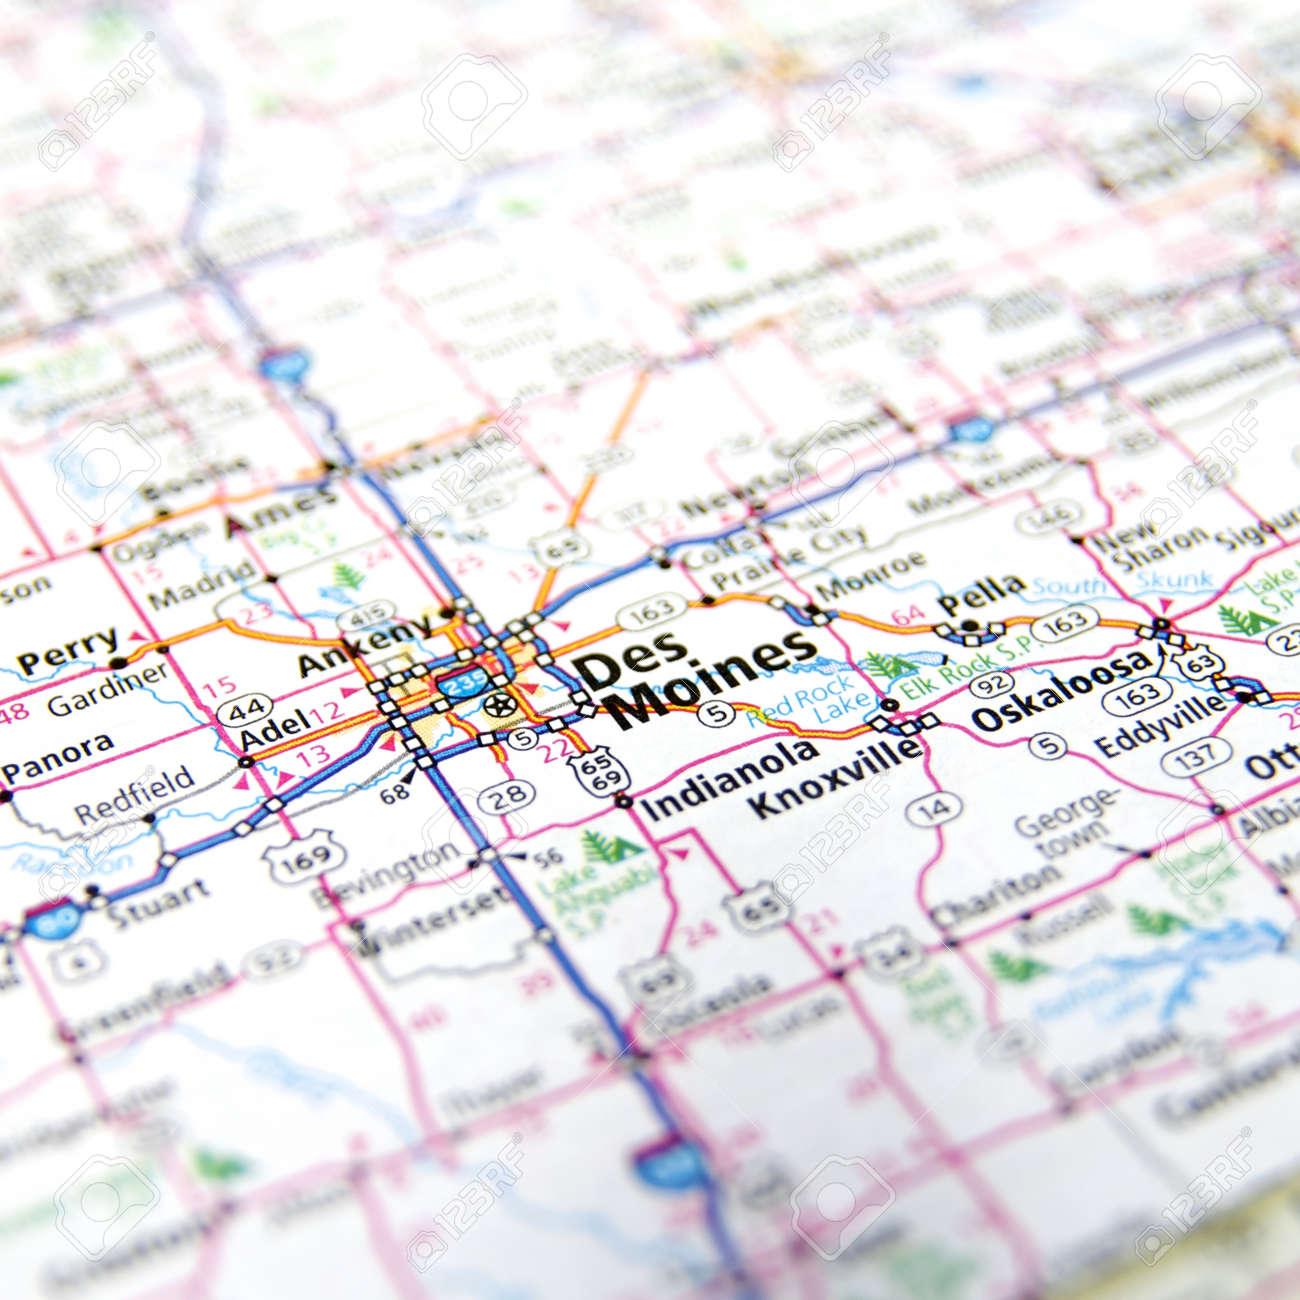 Close-Up map of Des Moines, Iowa